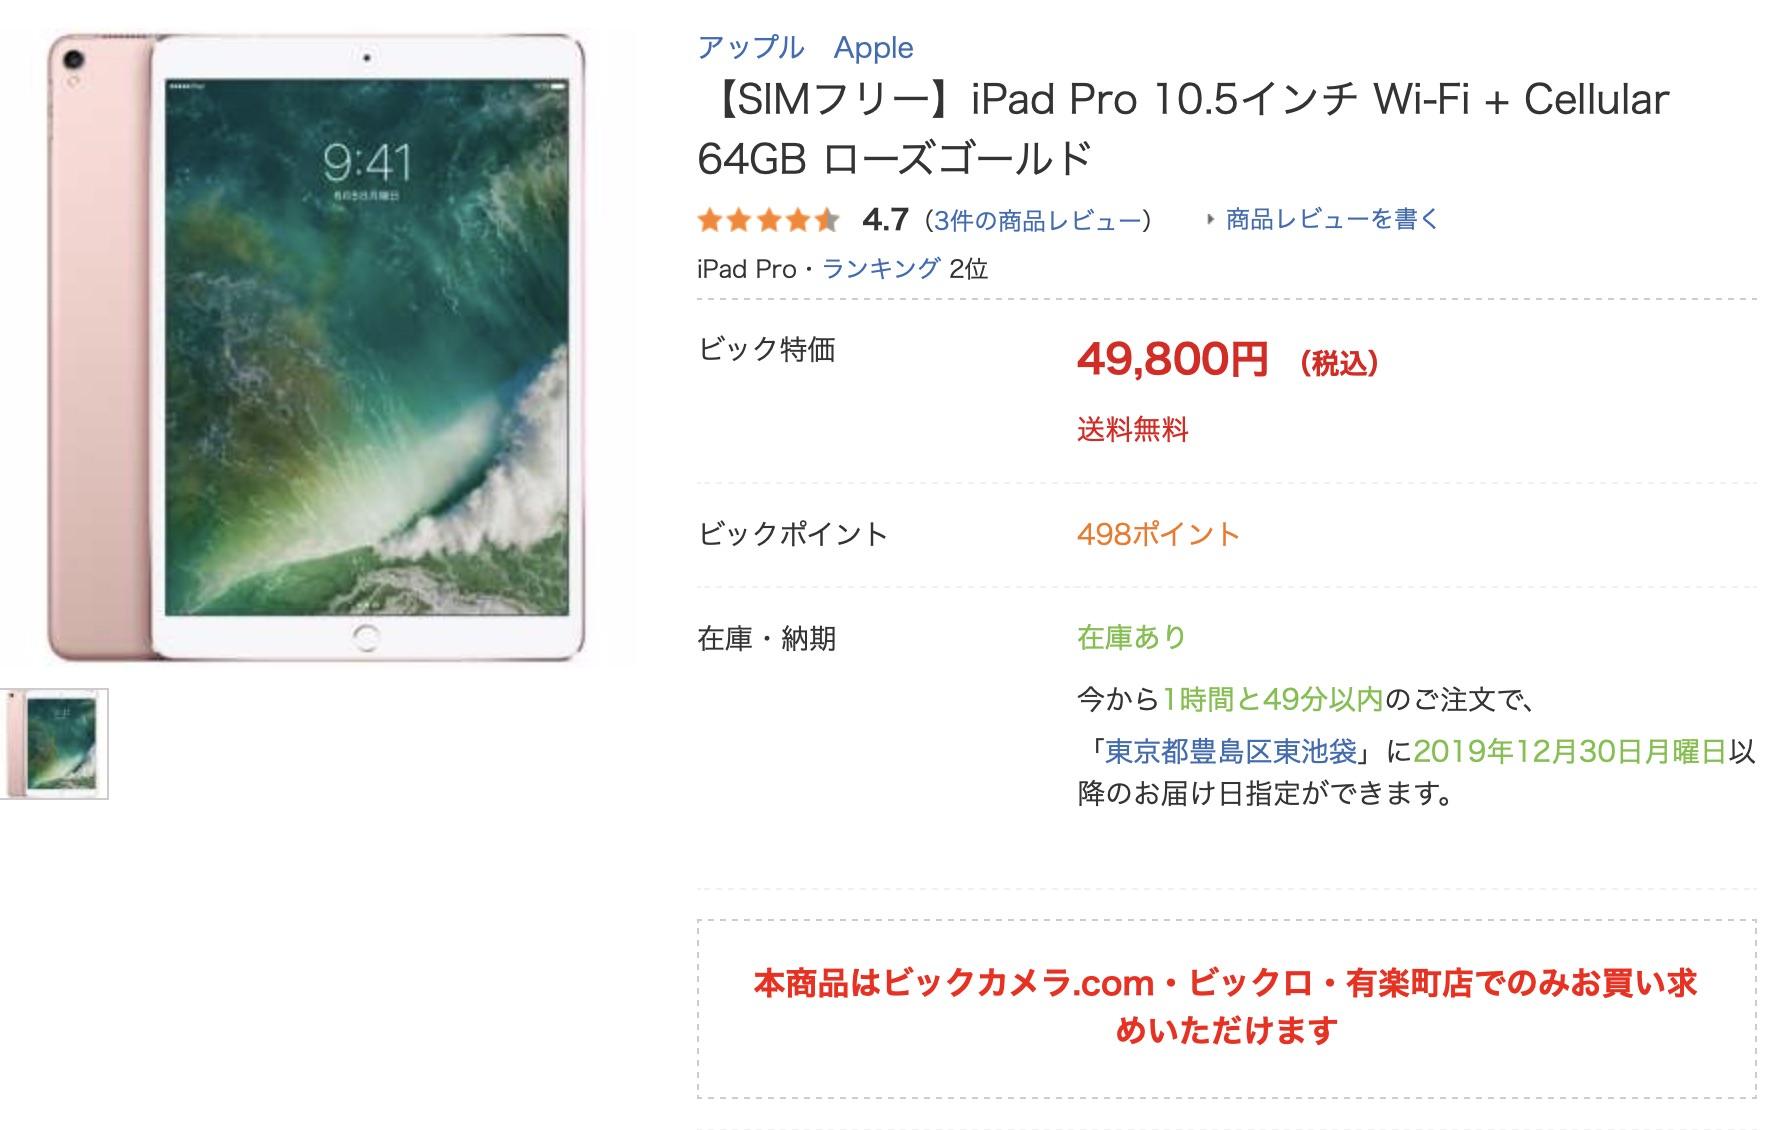 【SIMフリー】iPad Pro 10.5インチ Wi-Fi + Cellular 64GB ローズゴールドが特価 49,800円 で販売中